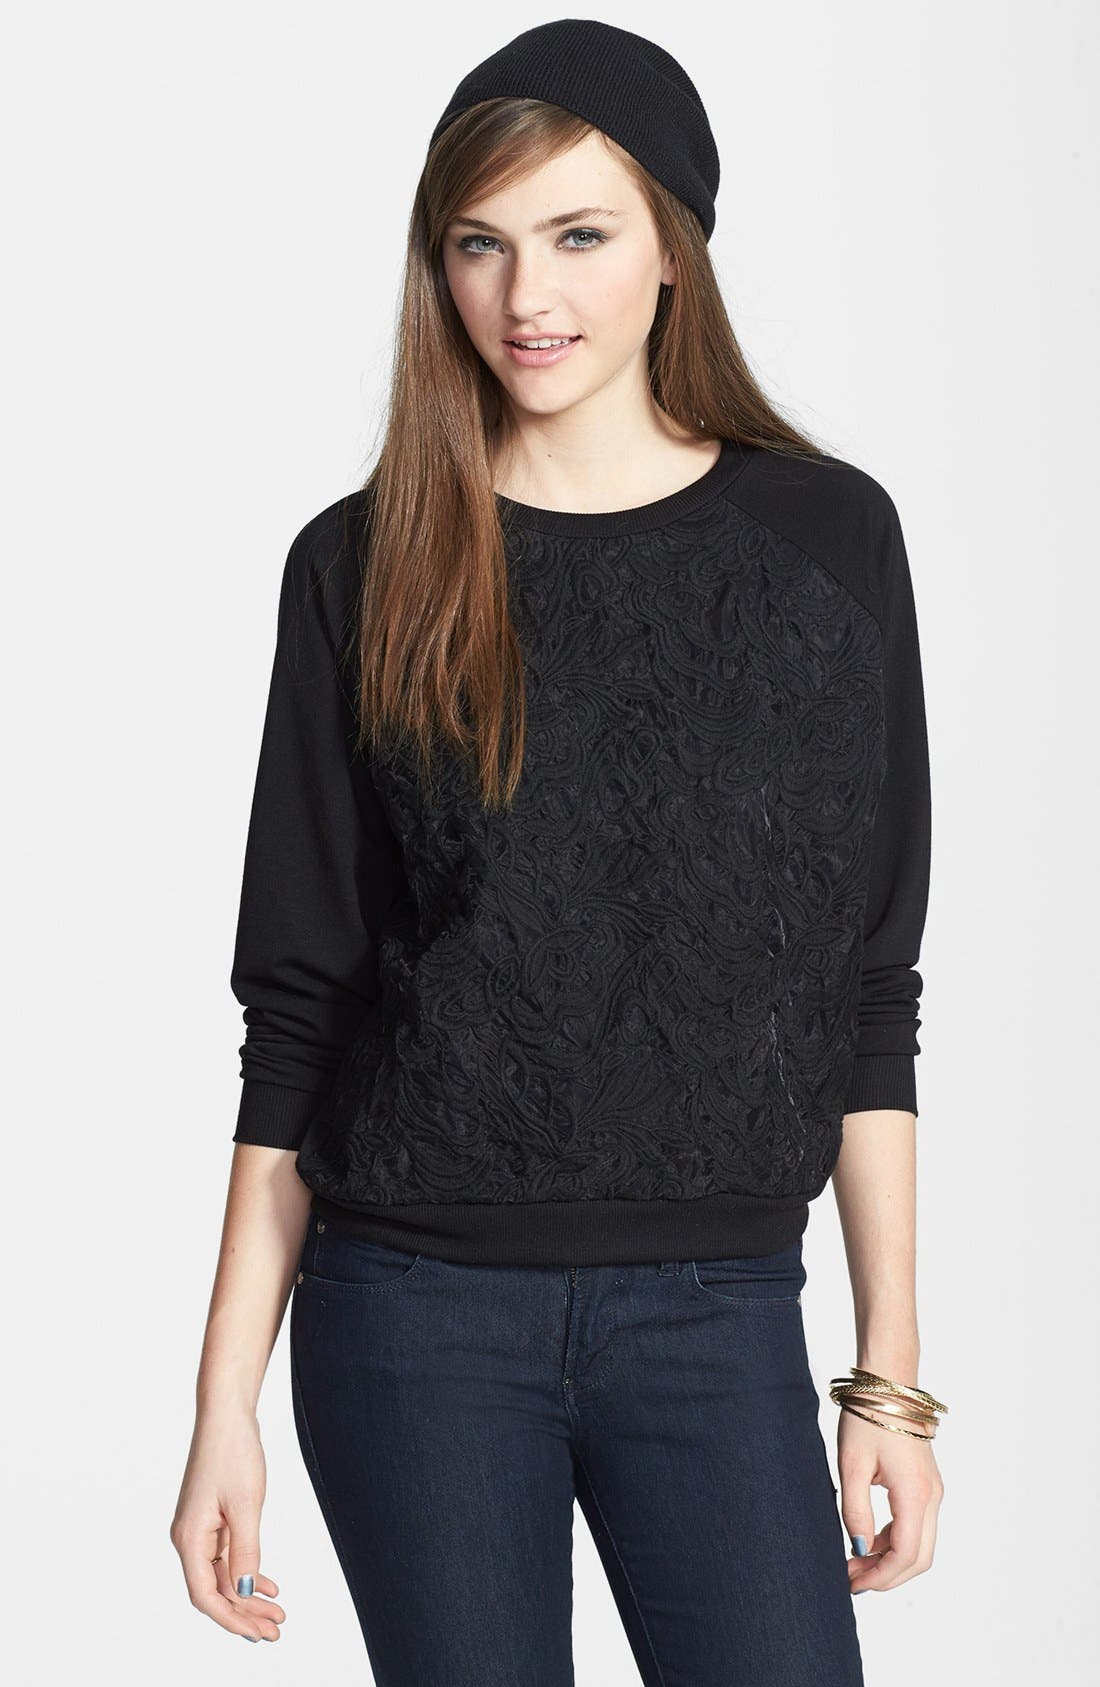 Alternate Image 1 Selected - Elodie Embroidered Organza Sweatshirt (Juniors)